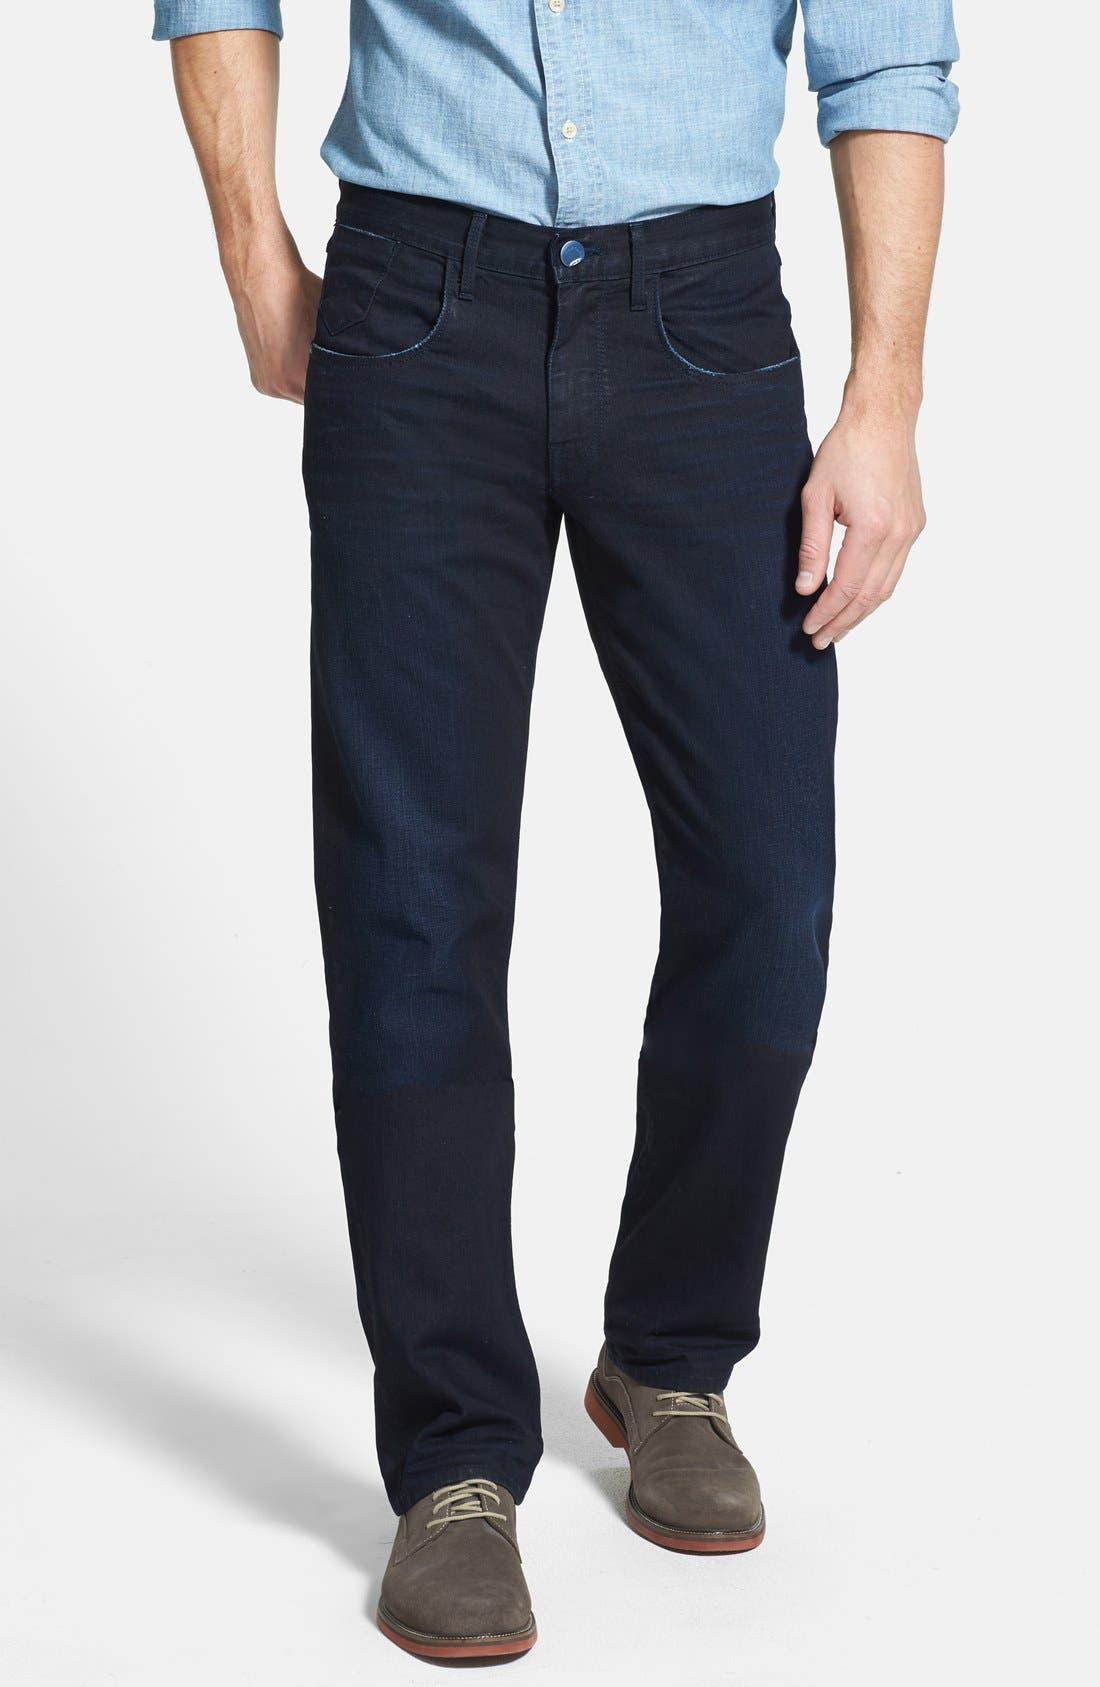 Alternate Image 1 Selected - Robert Graham 'Rocker' Slim Fit Stretch Pants